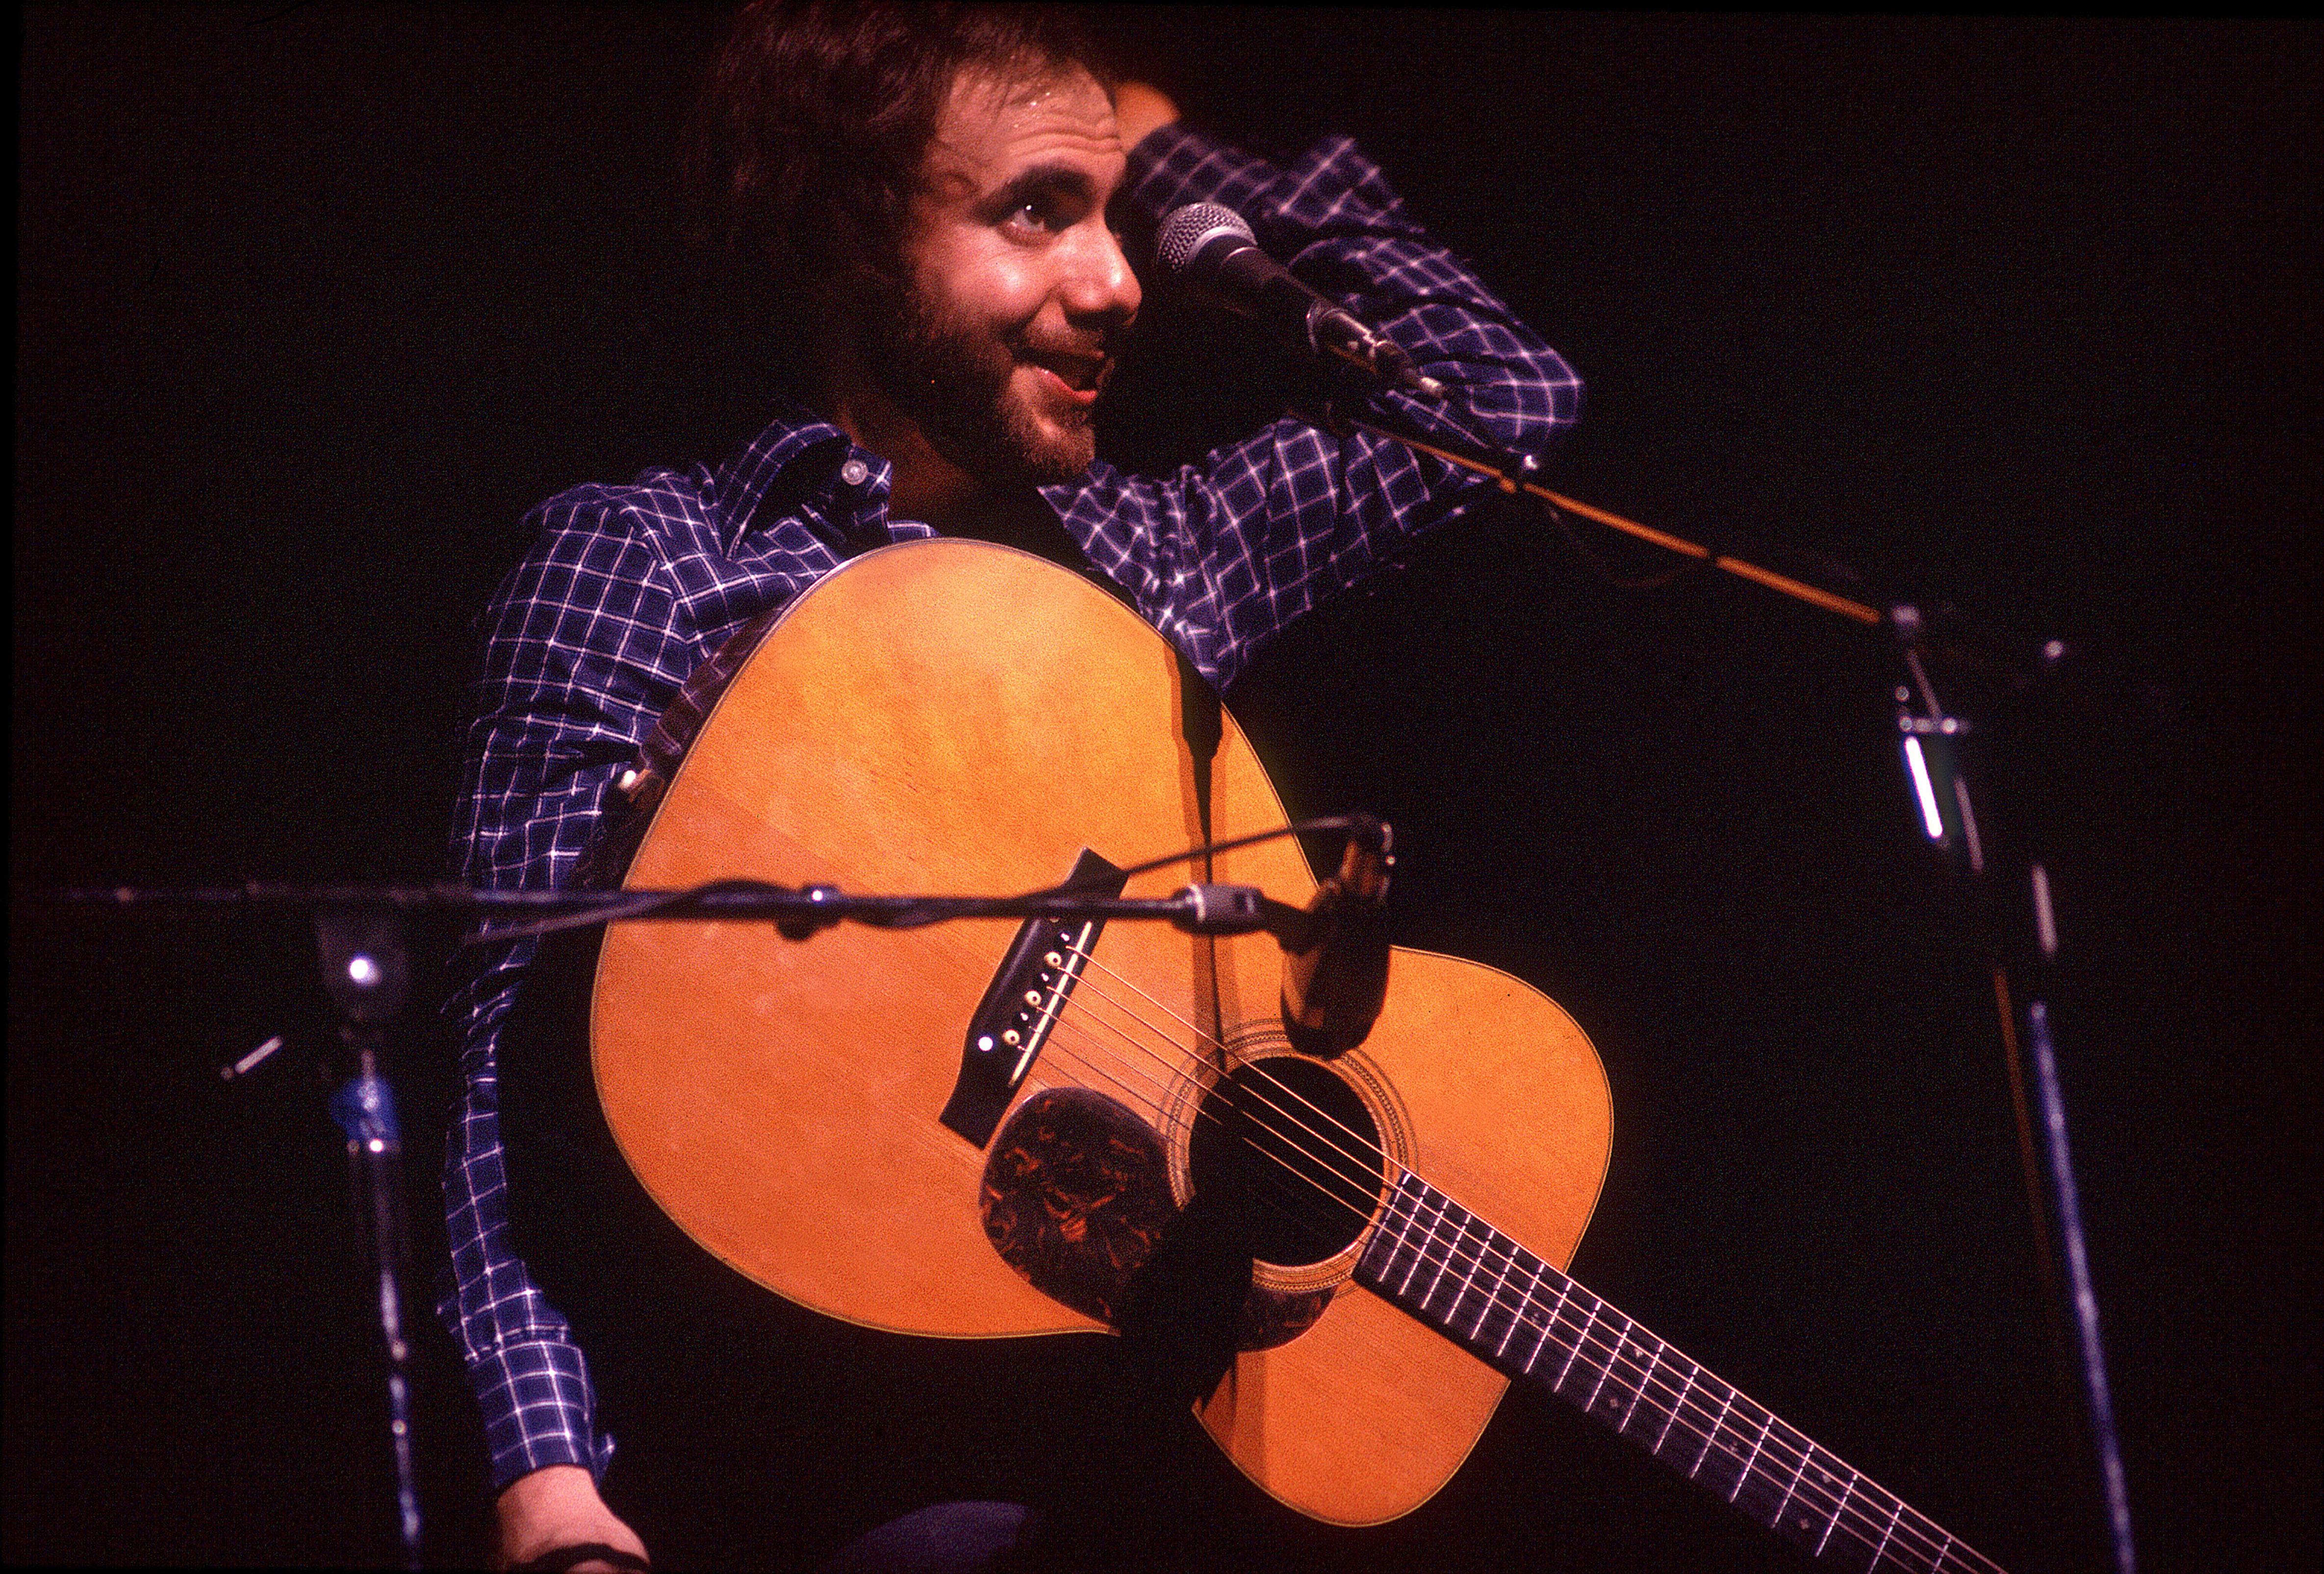 Steve Goodman Onstage At Auditorium Theater